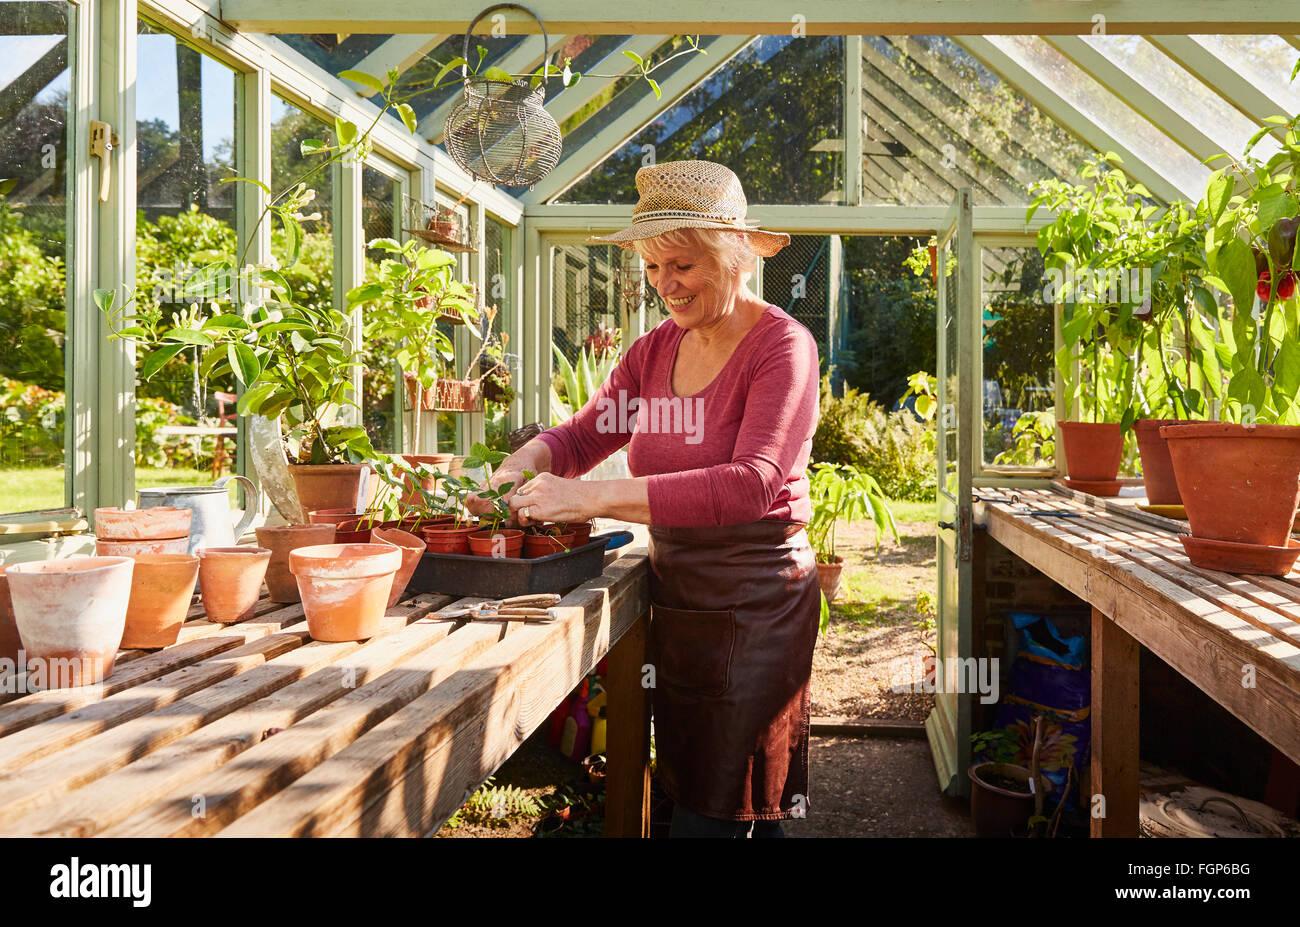 Senior woman potting plants in sunny greenhouse - Stock Image